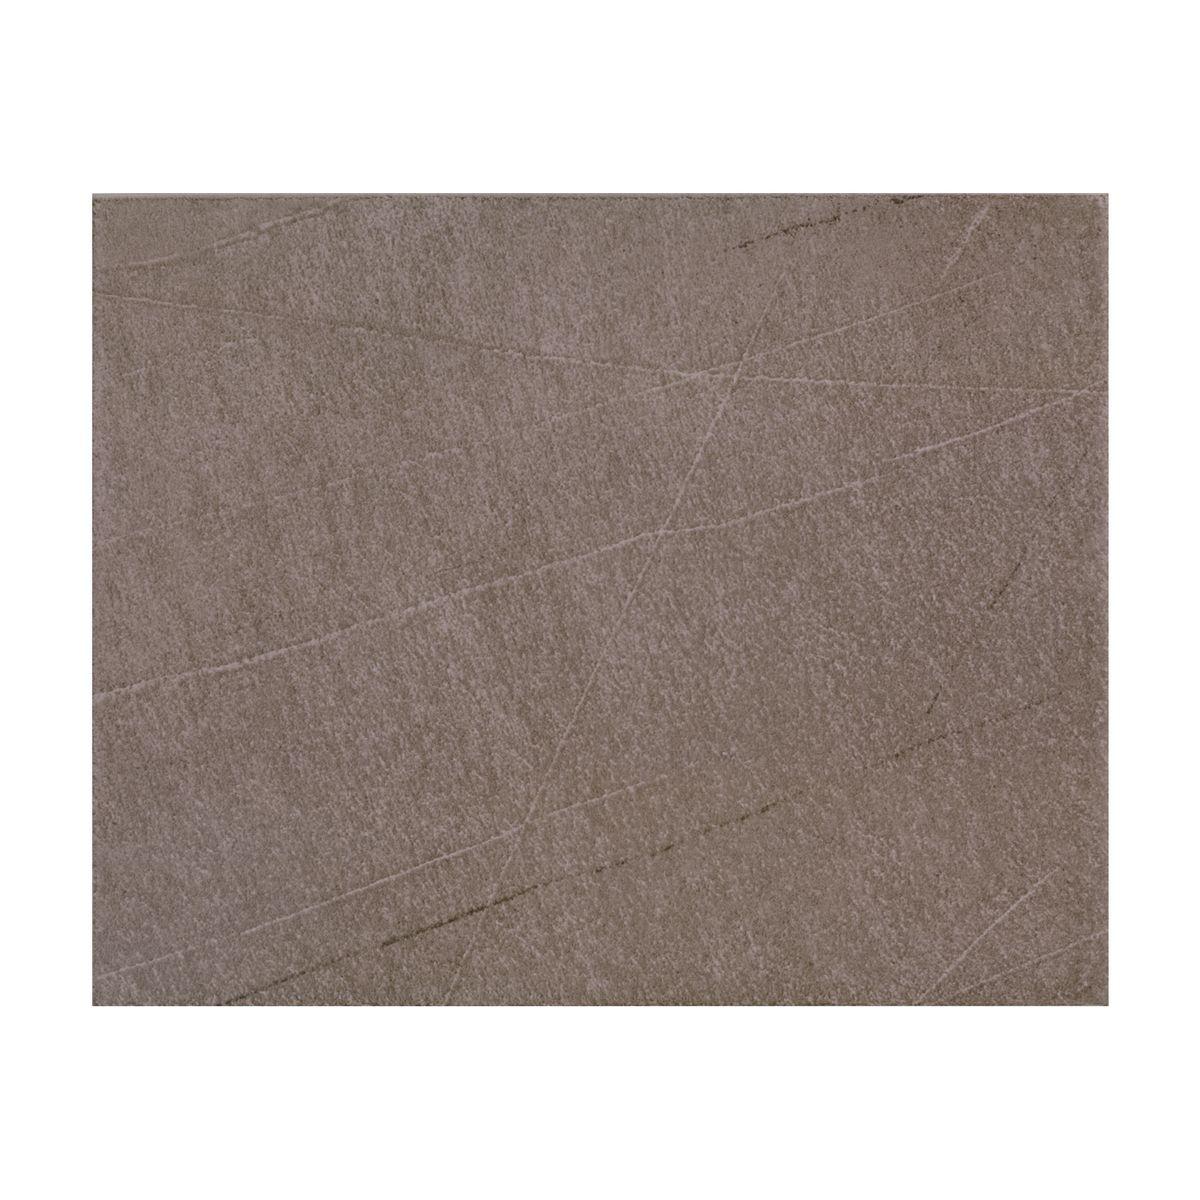 Polvere di ceramica leroy merlin stunning pavimenti e for Floor in a box leroy merlin